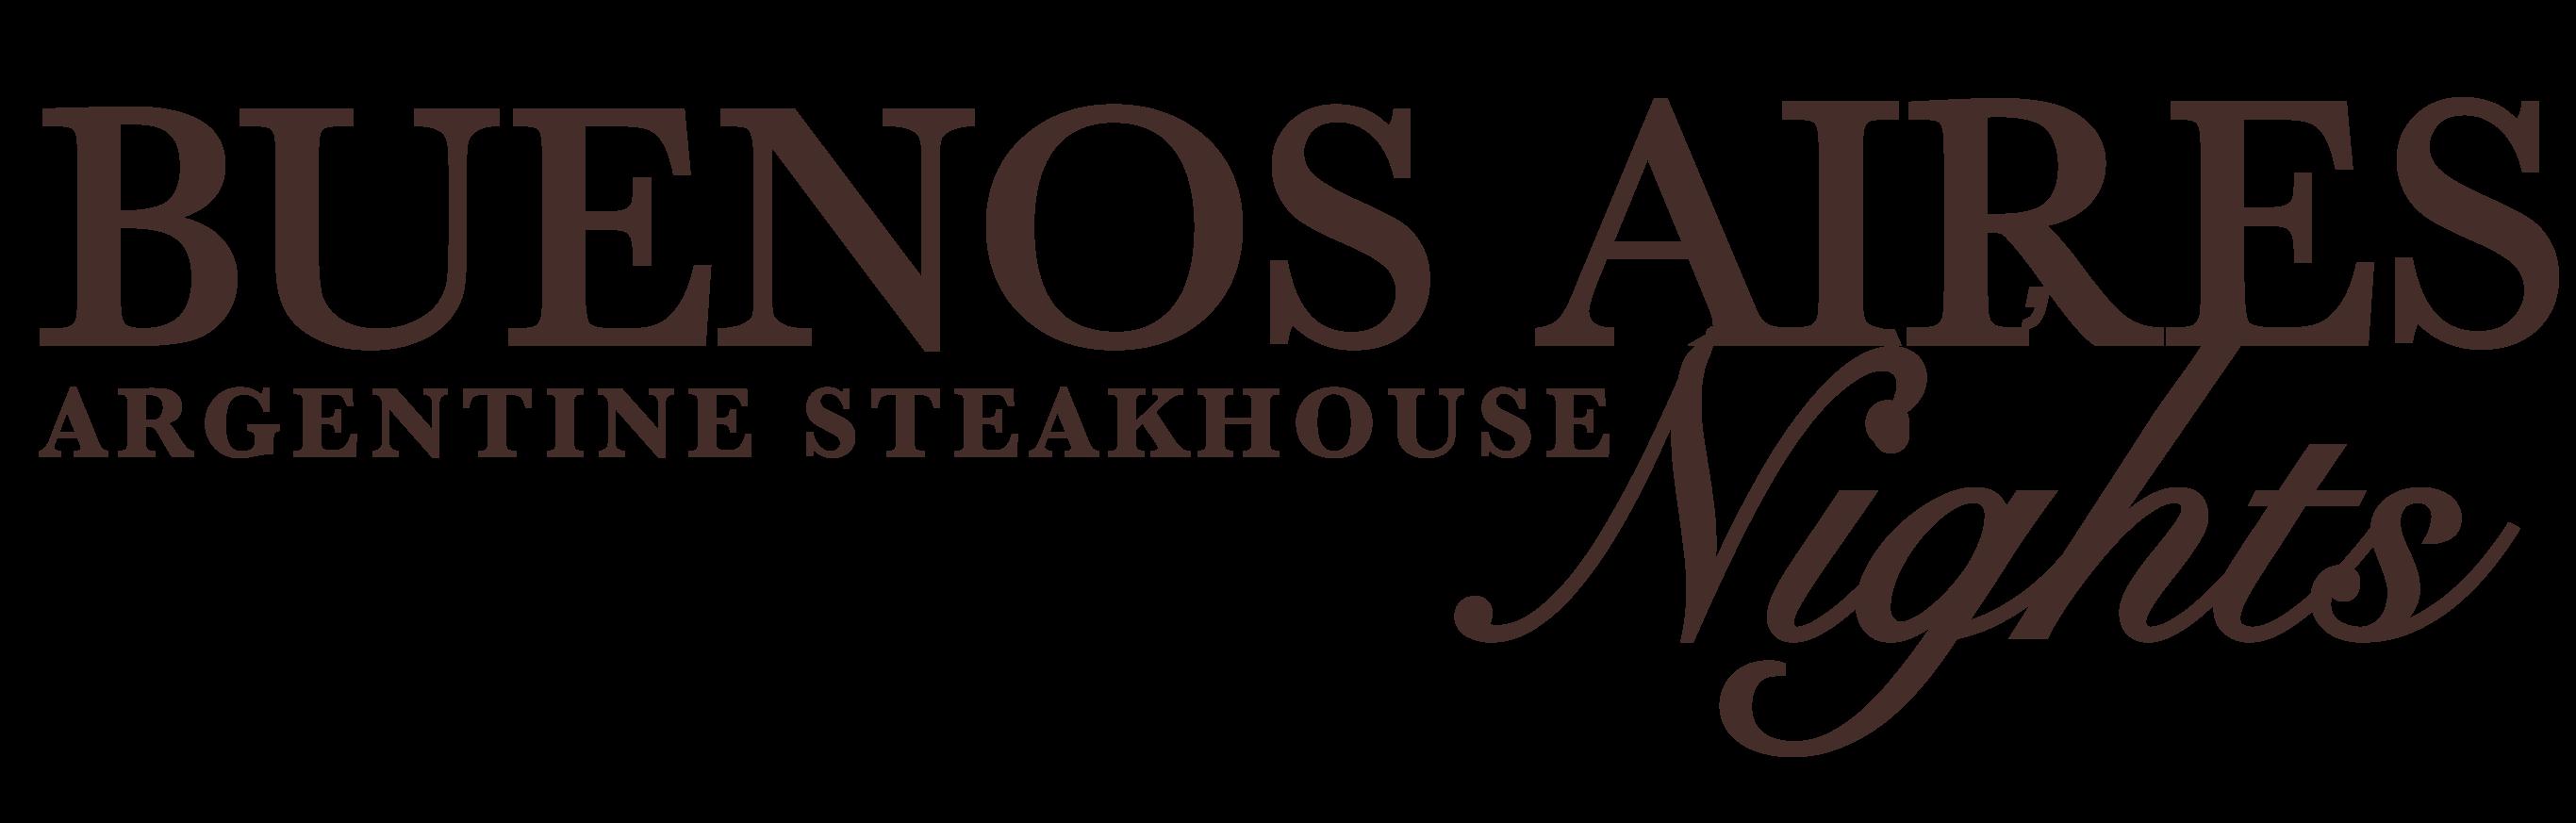 Buenos Aires Nights Argentine Steakhouse